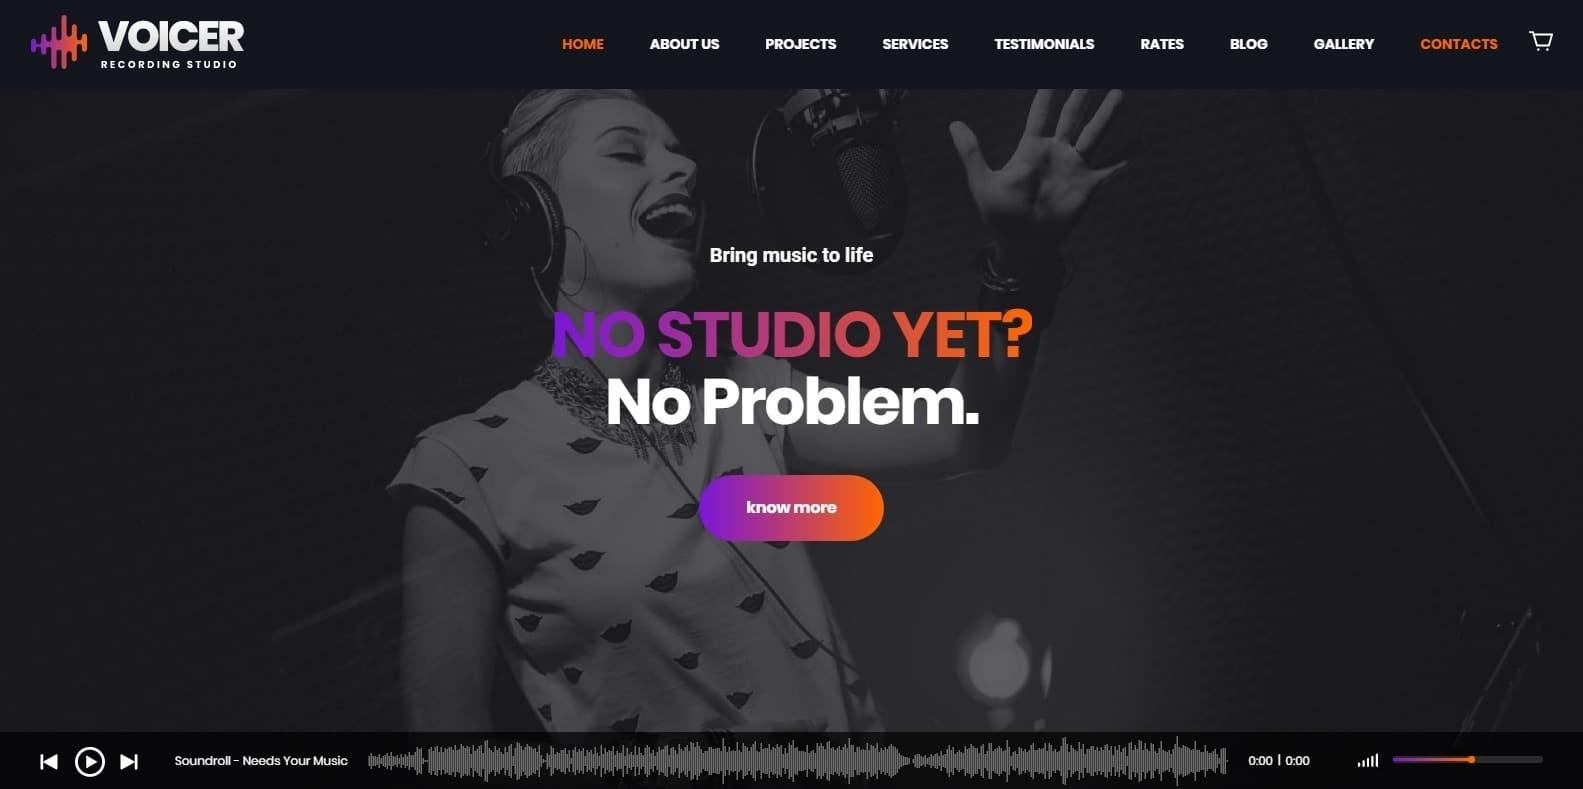 voicer-recording-studio-website-template